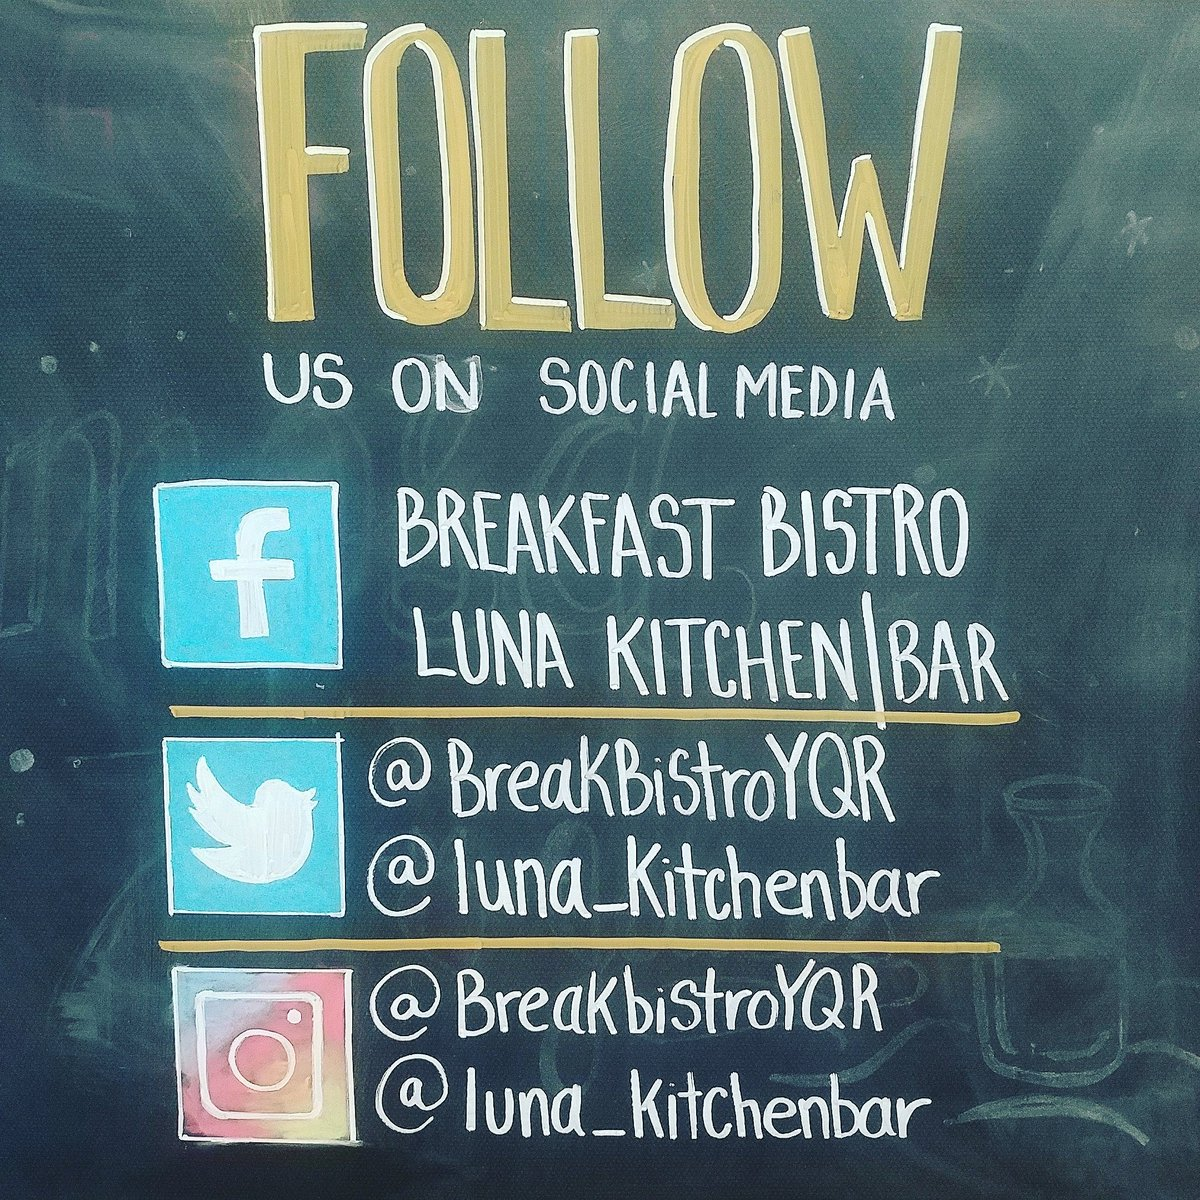 Breakfast Bistro (@BreakBistroYQR) | Twitter